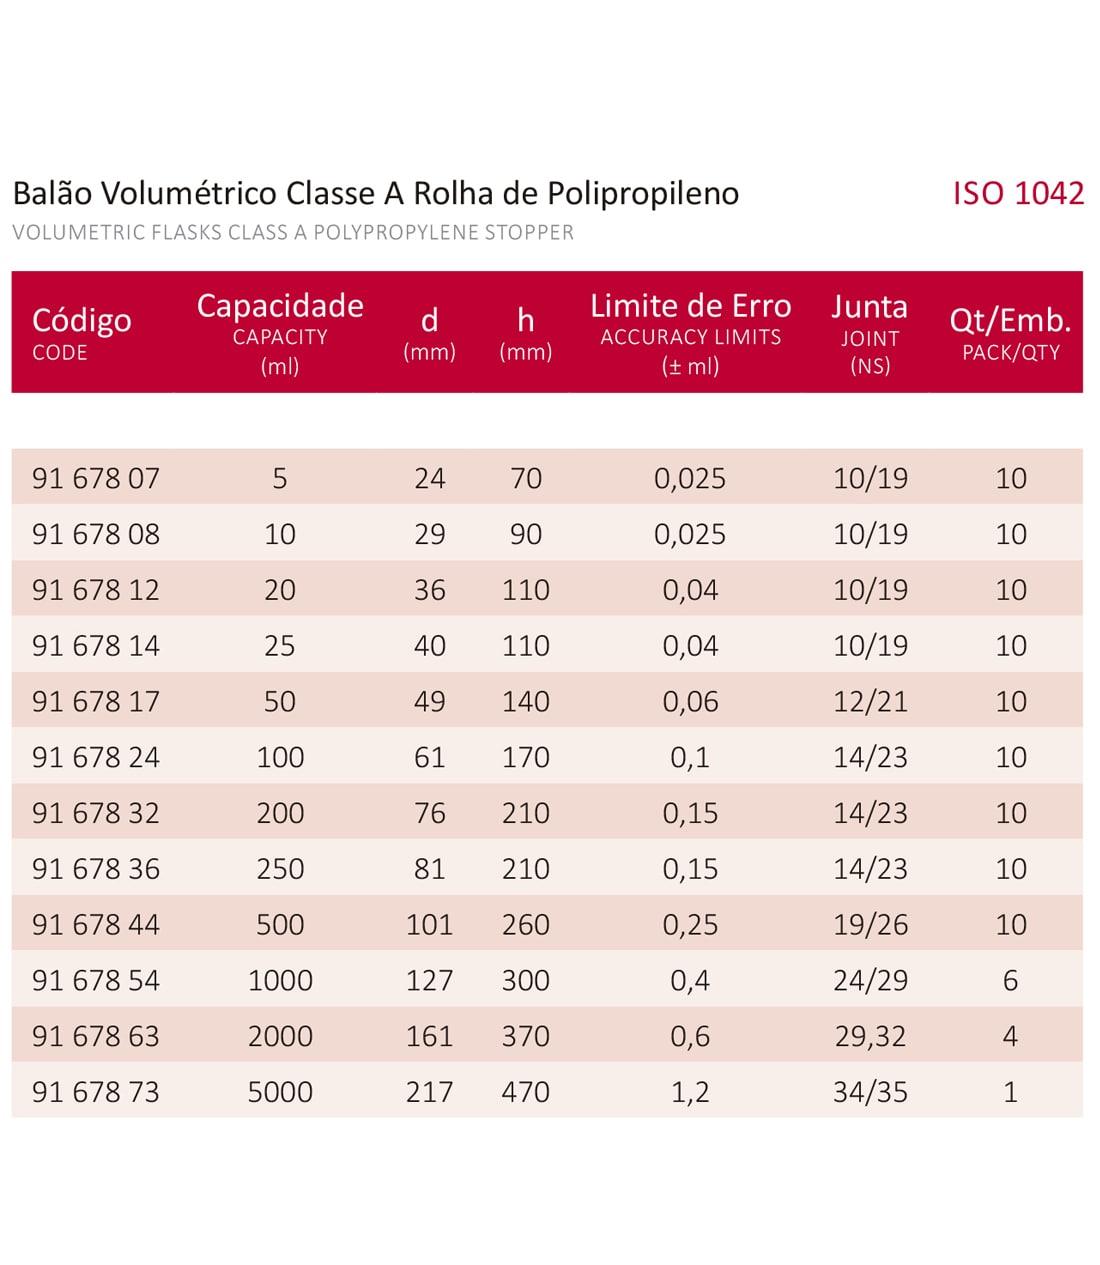 BALÃO VOLUMÉTRICO CLASSE A ROLHA POLI C/ CERTIFICADO RBC 3000 ML - Marca Laborglas - Cód. 9167868-R